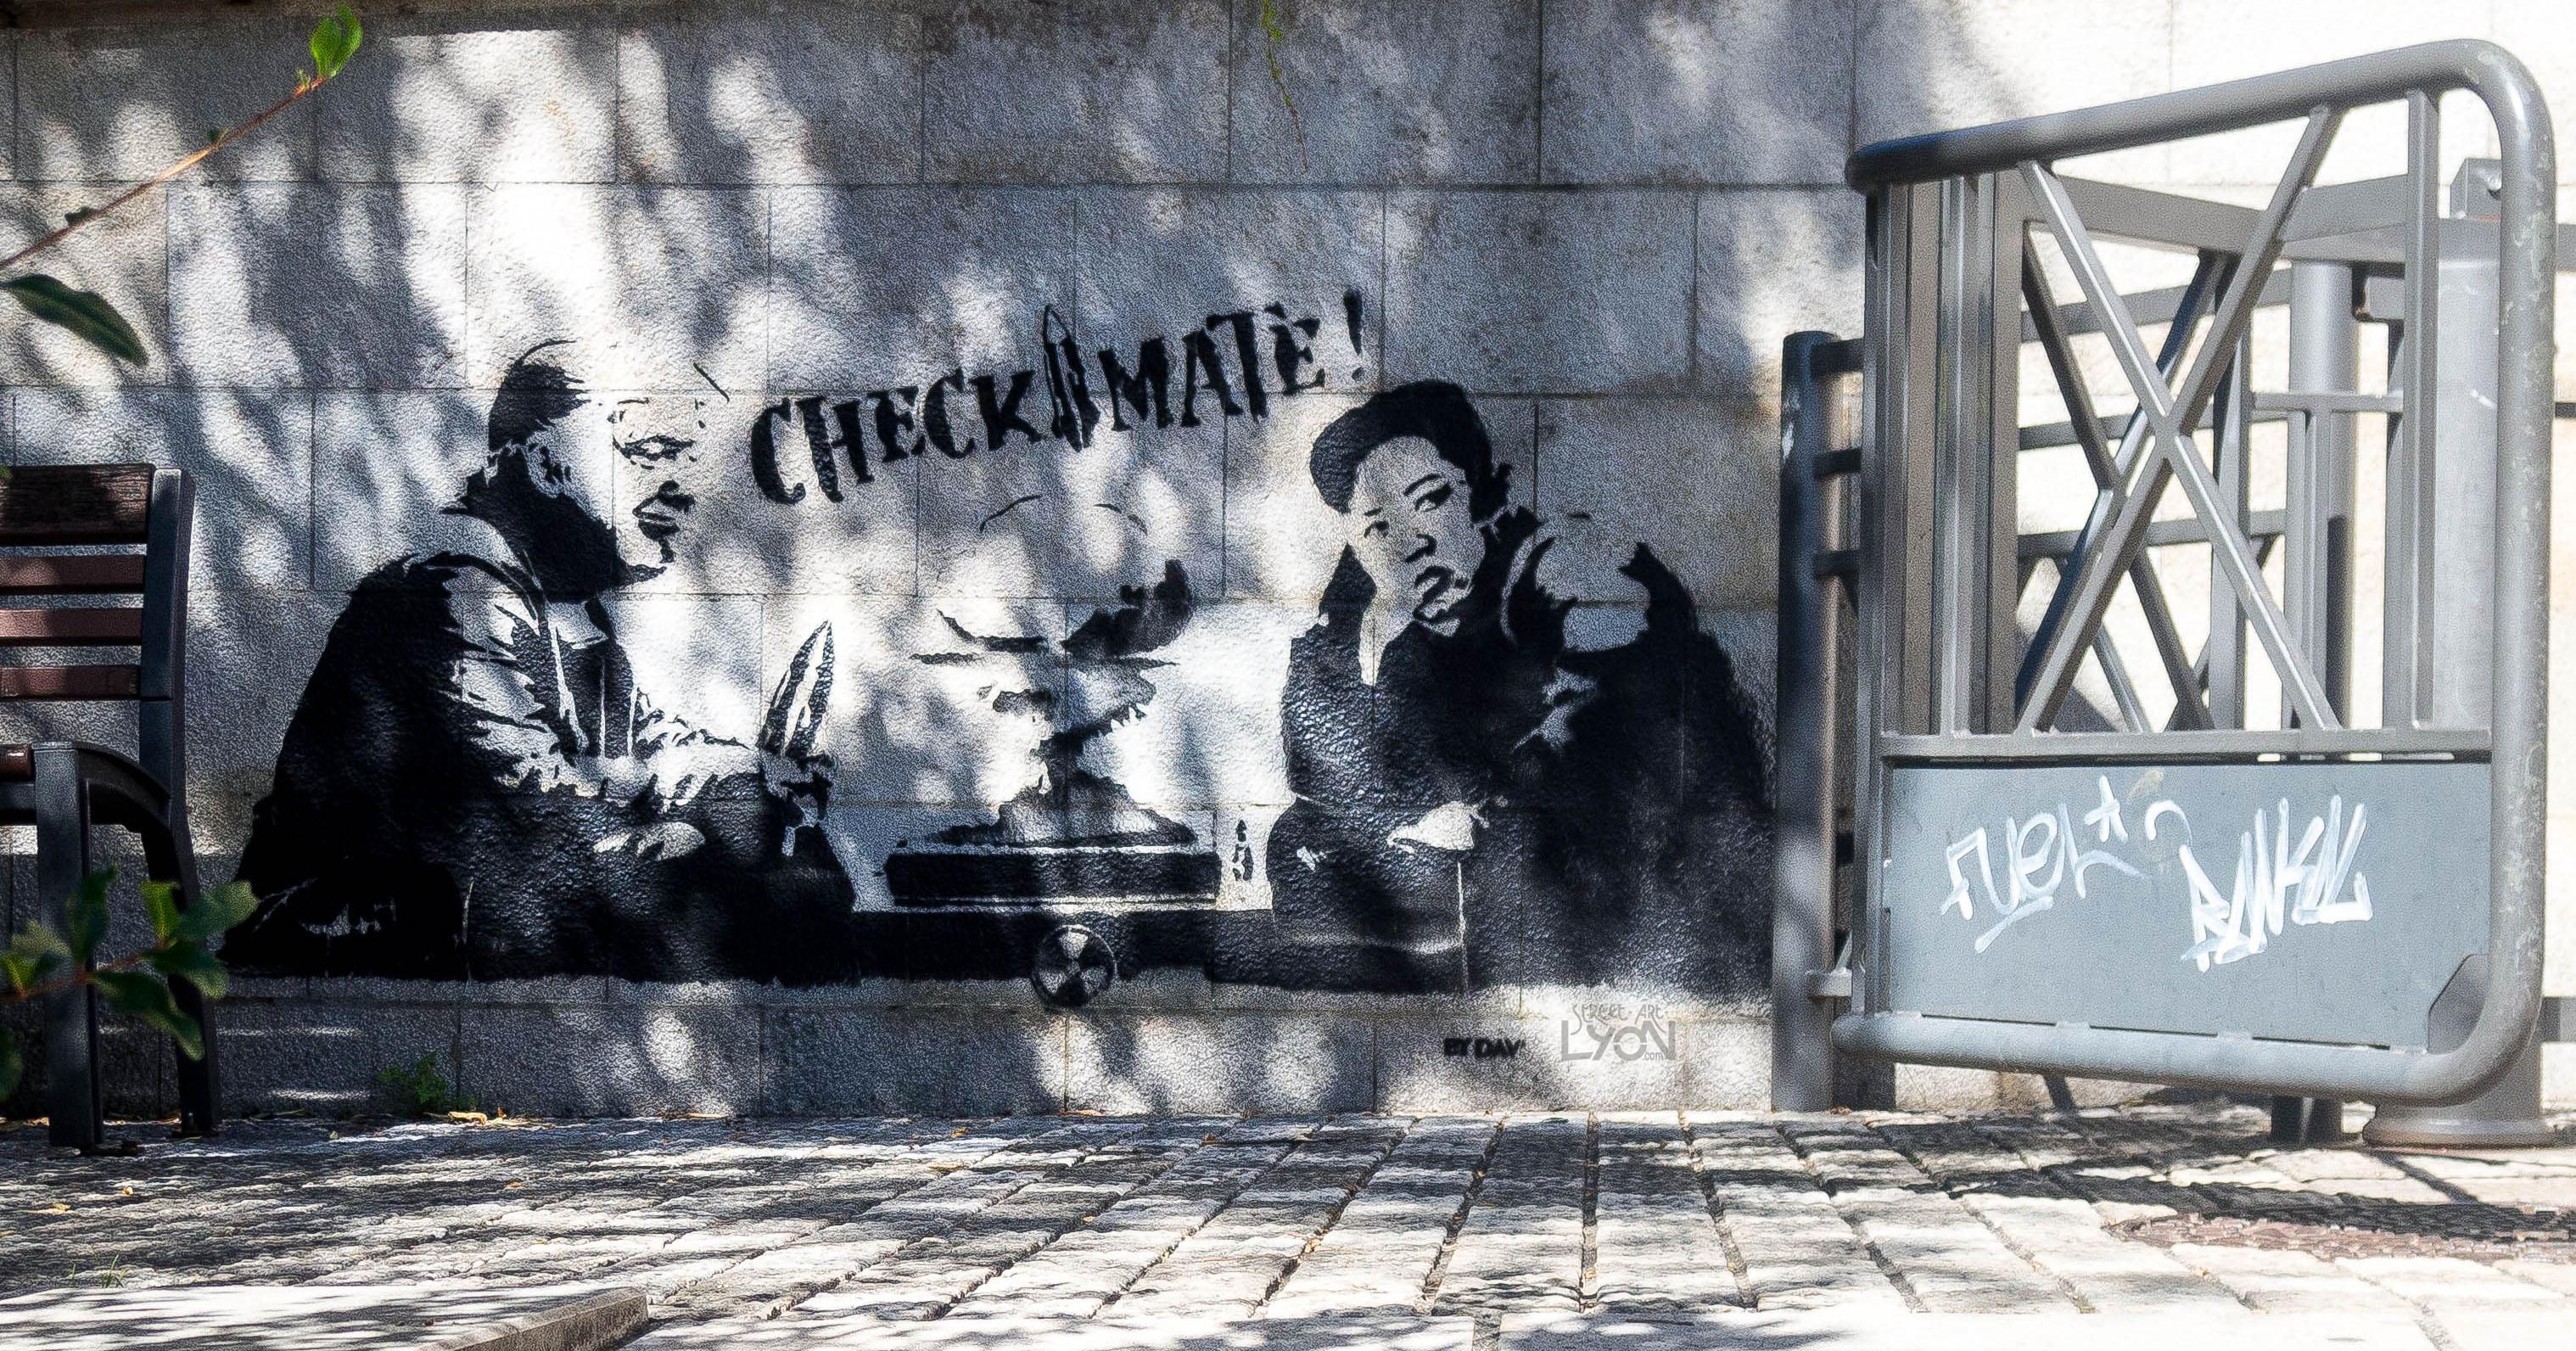 by dav checkmate